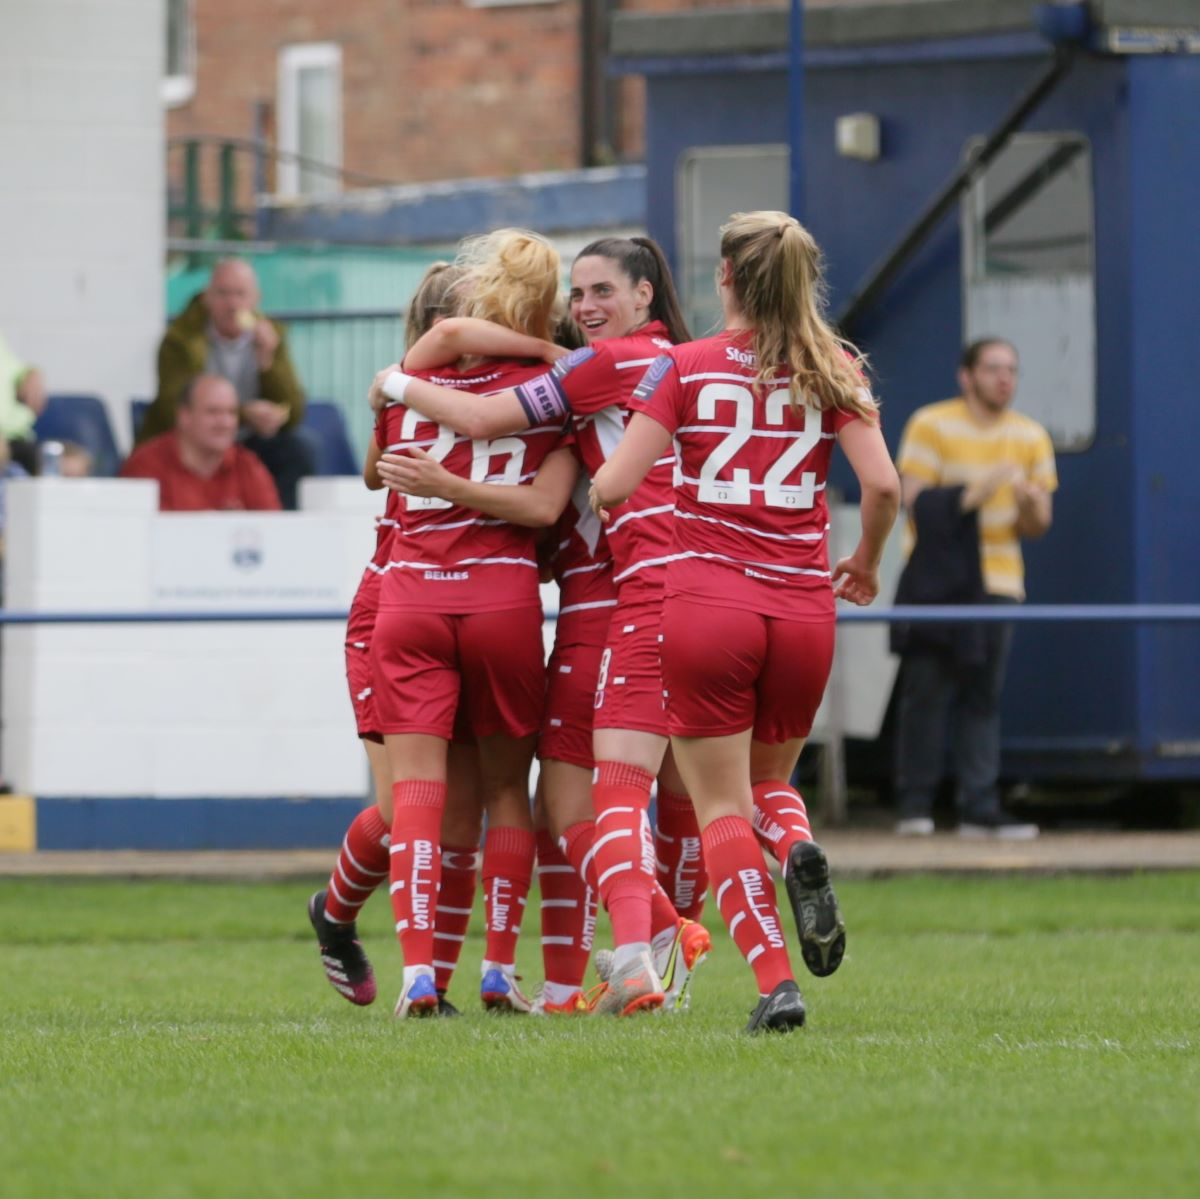 Doncaster Rovers Belles celebrate their winner.